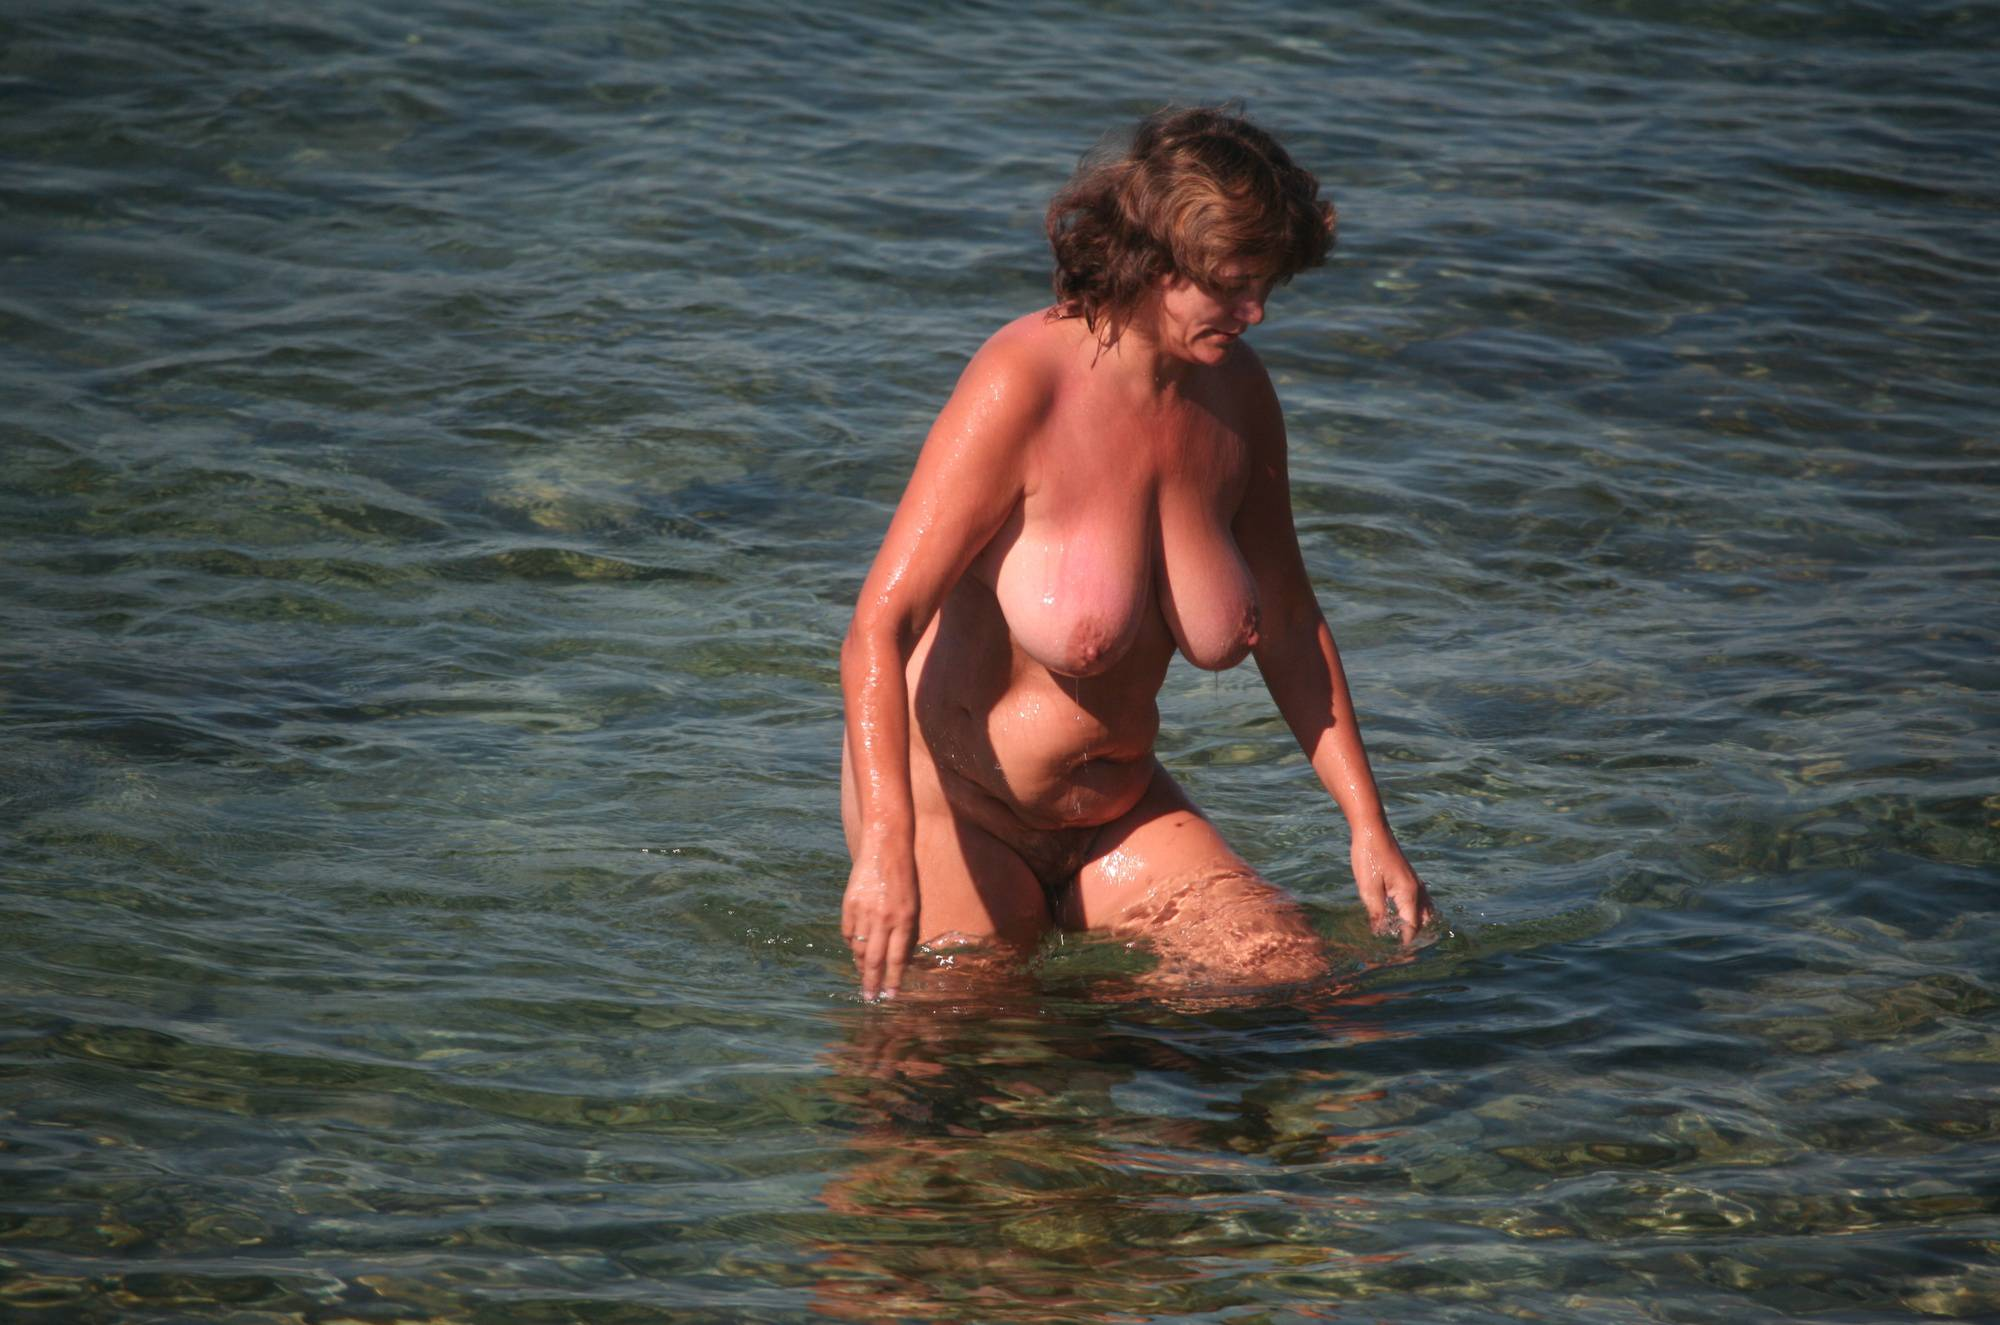 Nudist Photos Crete Dog-Bathing Woman - 2